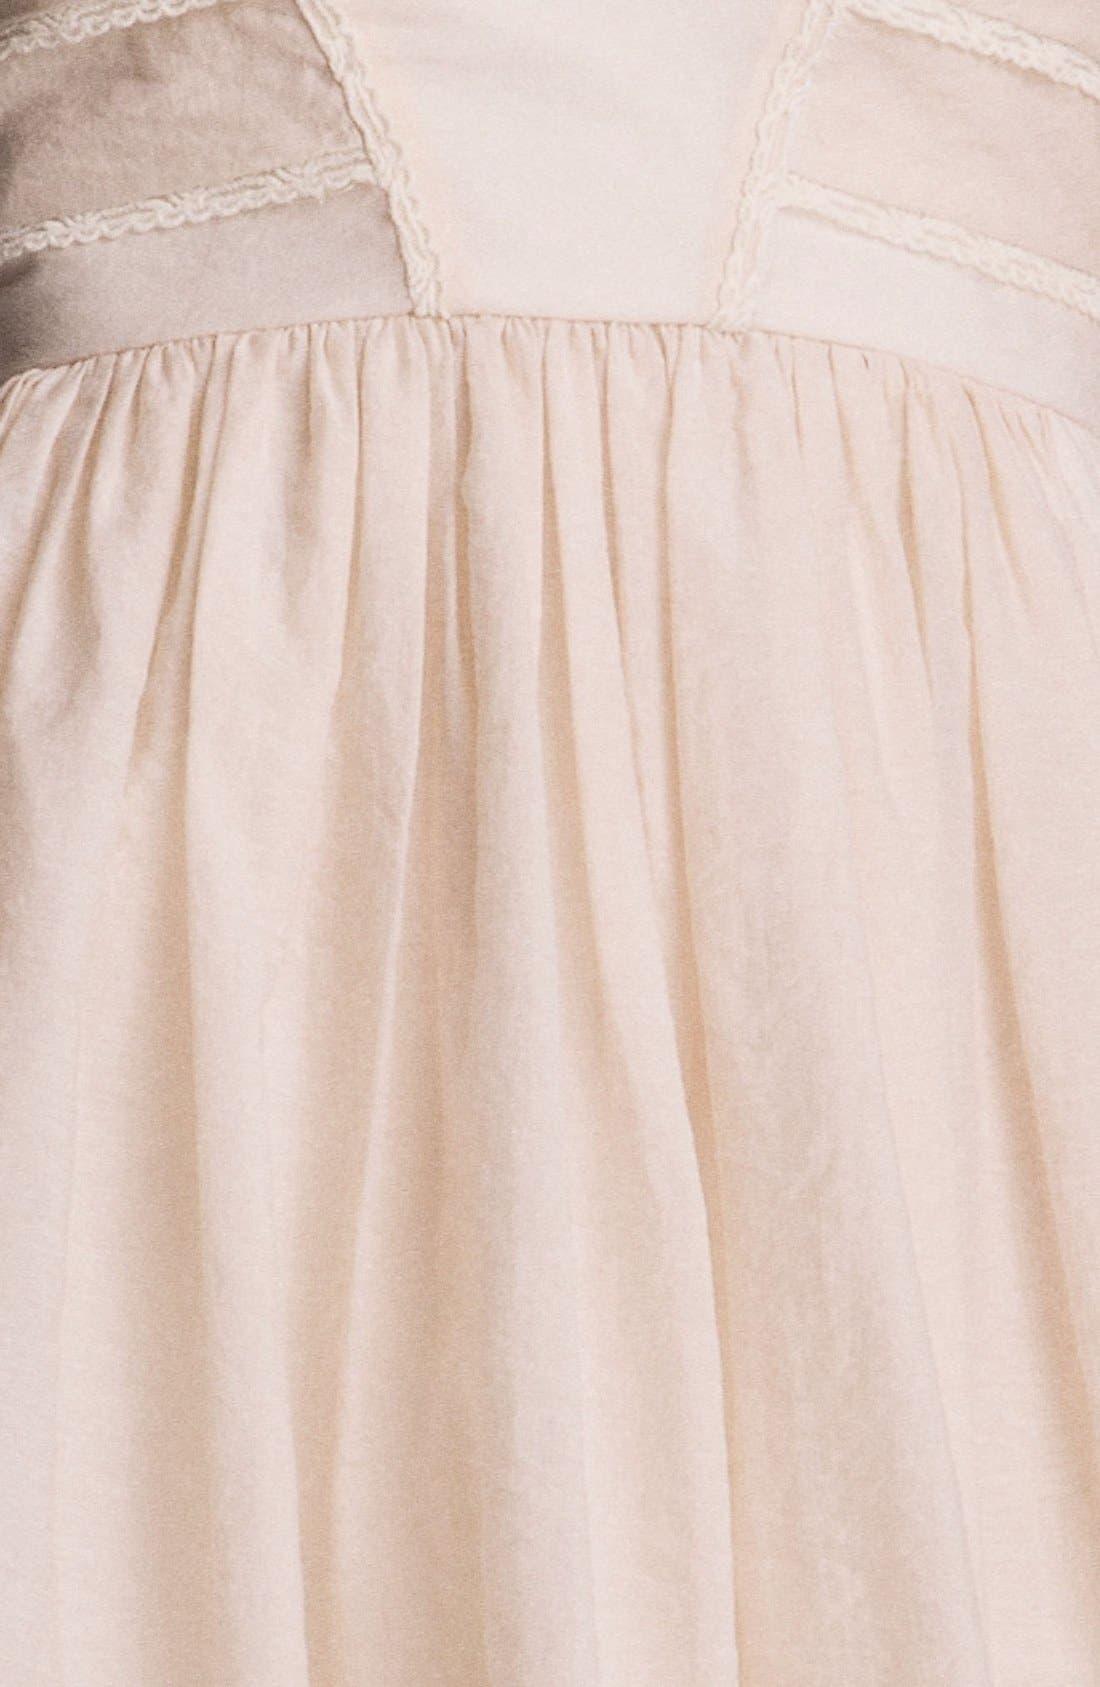 Alternate Image 3  - Jessica Simpson Lace Trim Fit & Flare Dress